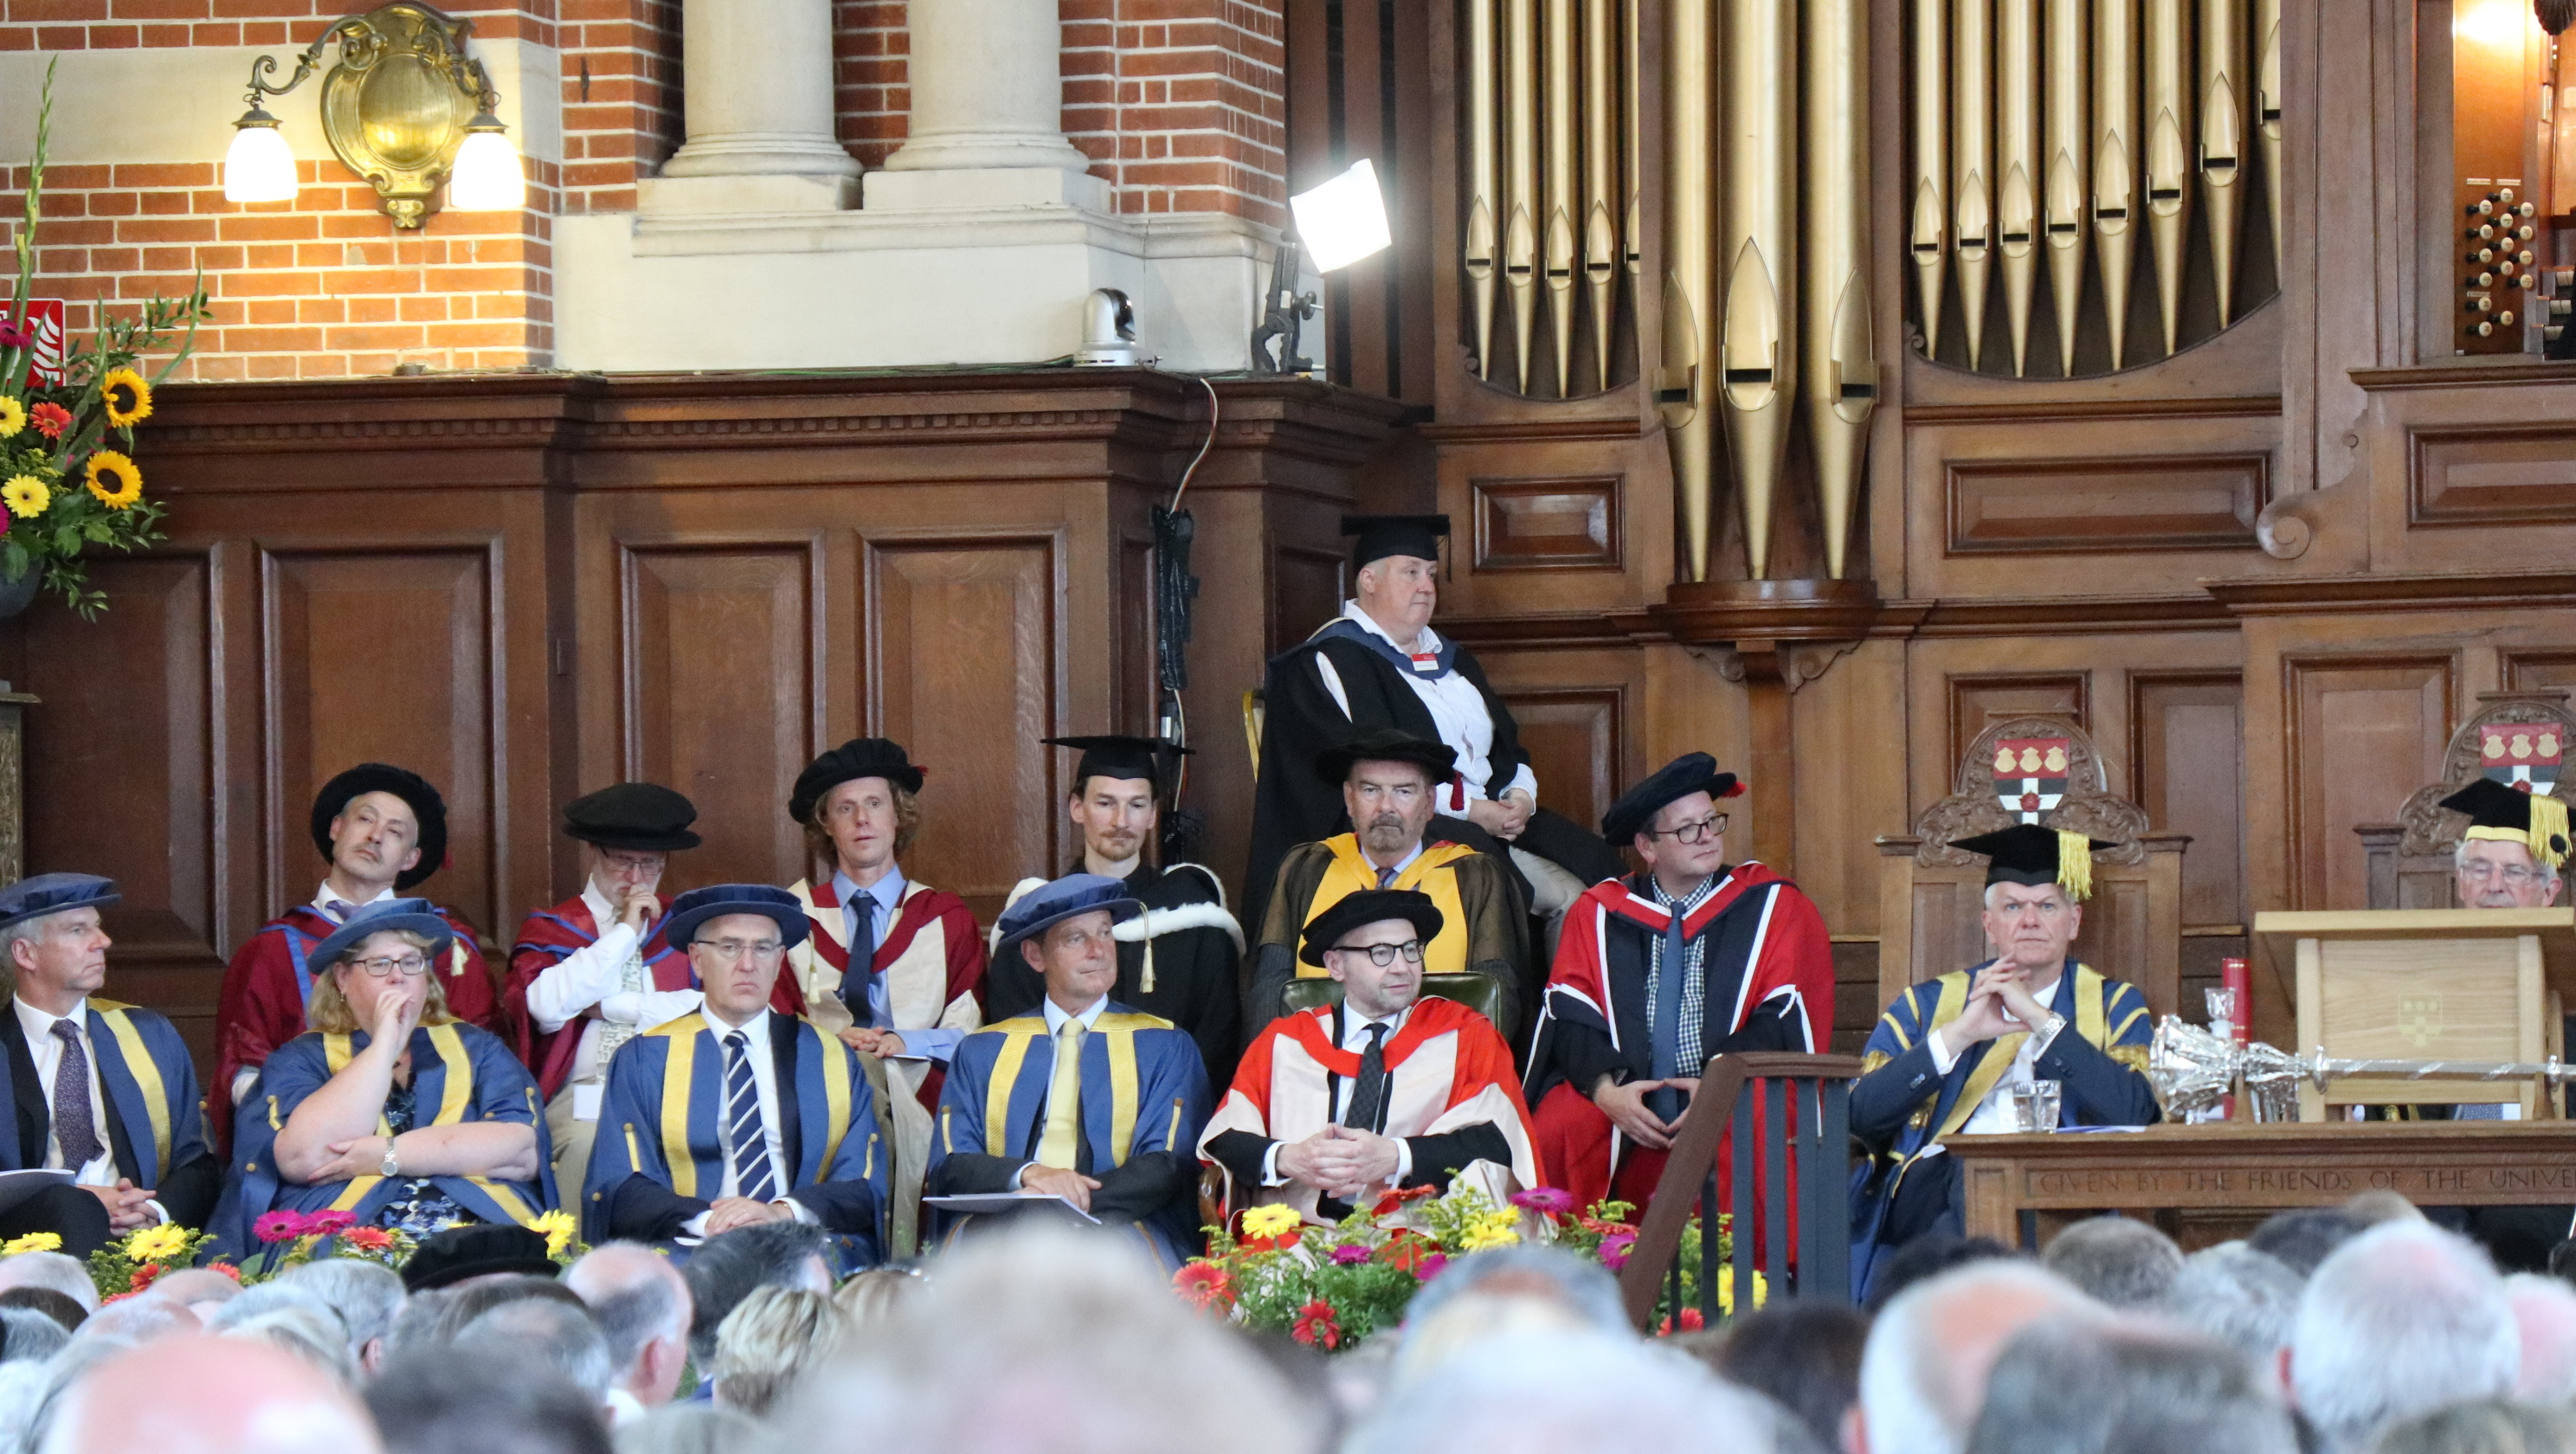 Jonathan Shalit graduation